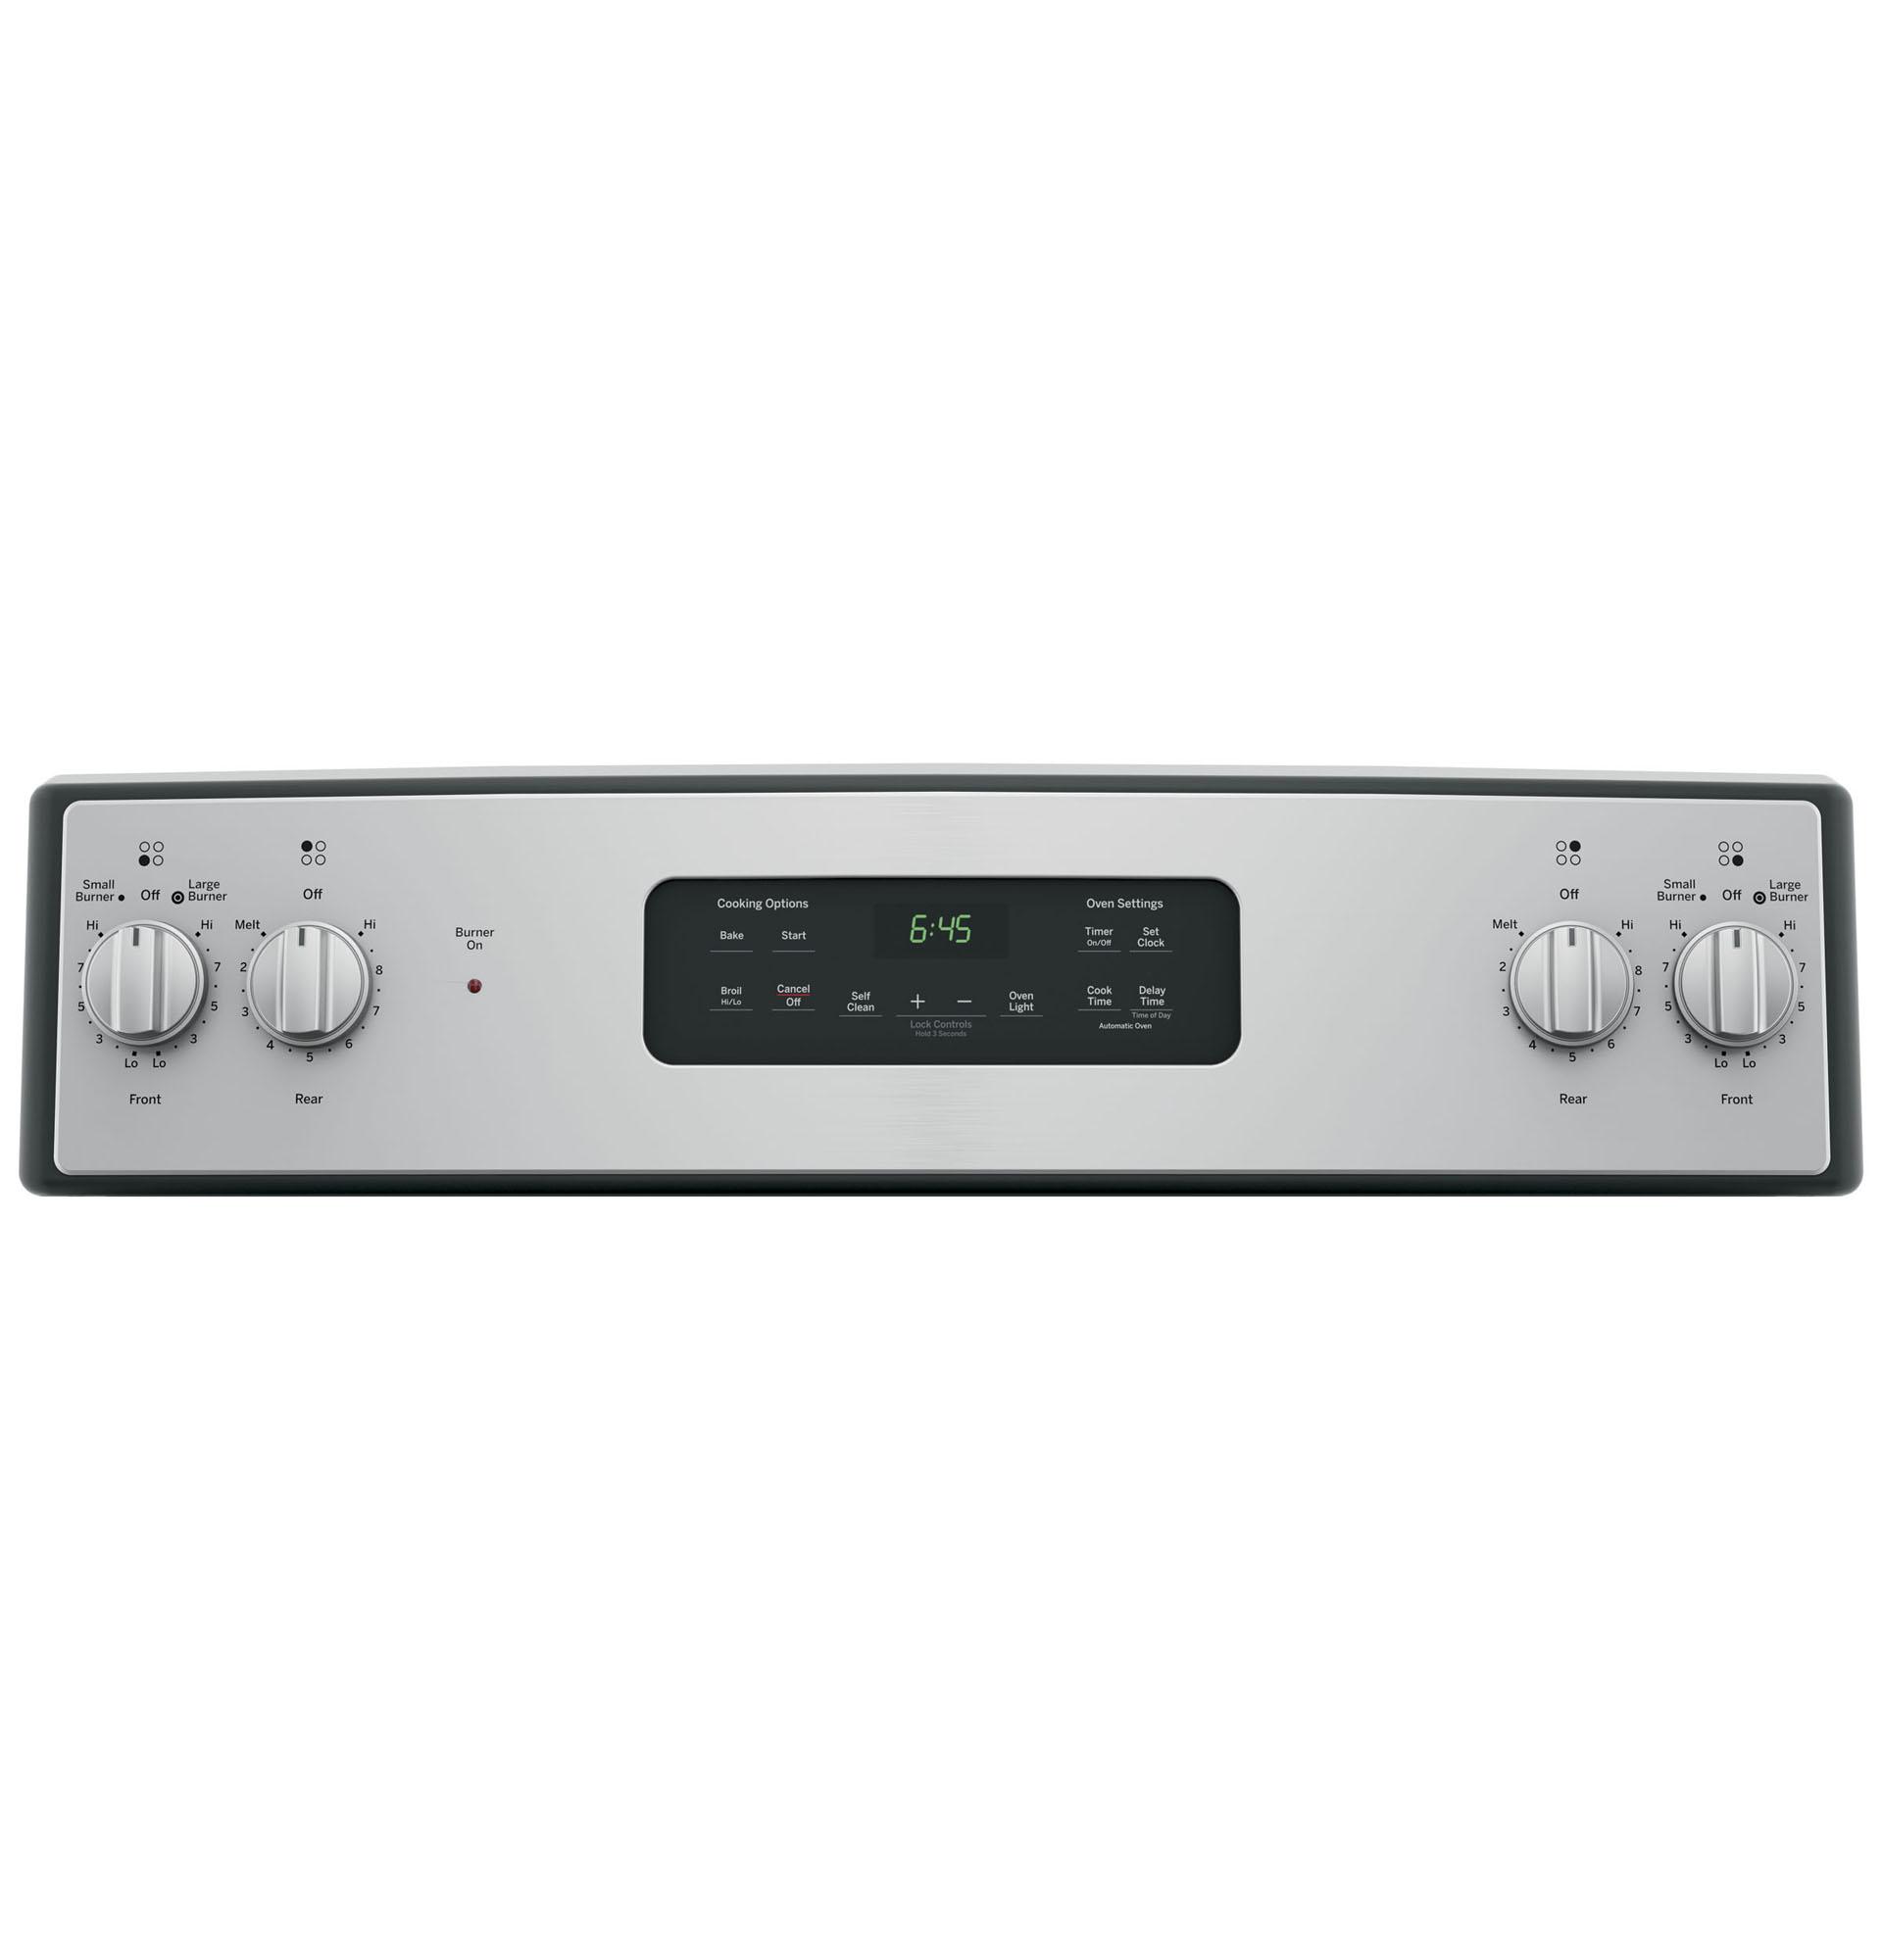 "GE Appliances JB645RKSS 30"" Freestanding Electric Range - Stainless Steel"